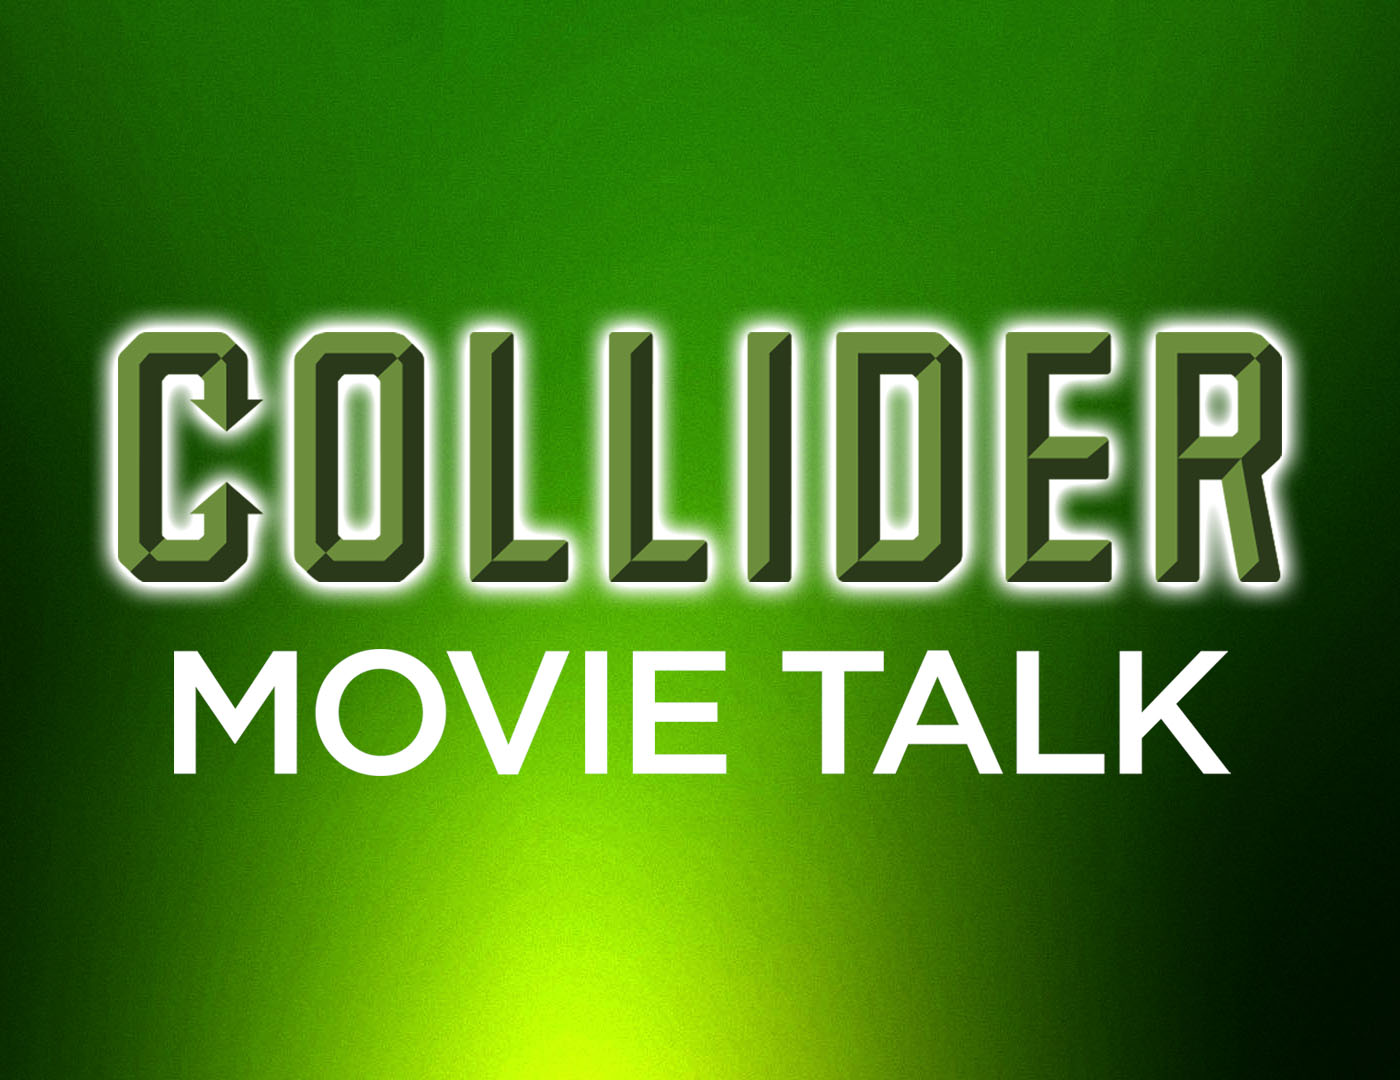 Collider Movie Talk - Alicia Vikander Cast As Lara Croft In Tomb Raider Reboot